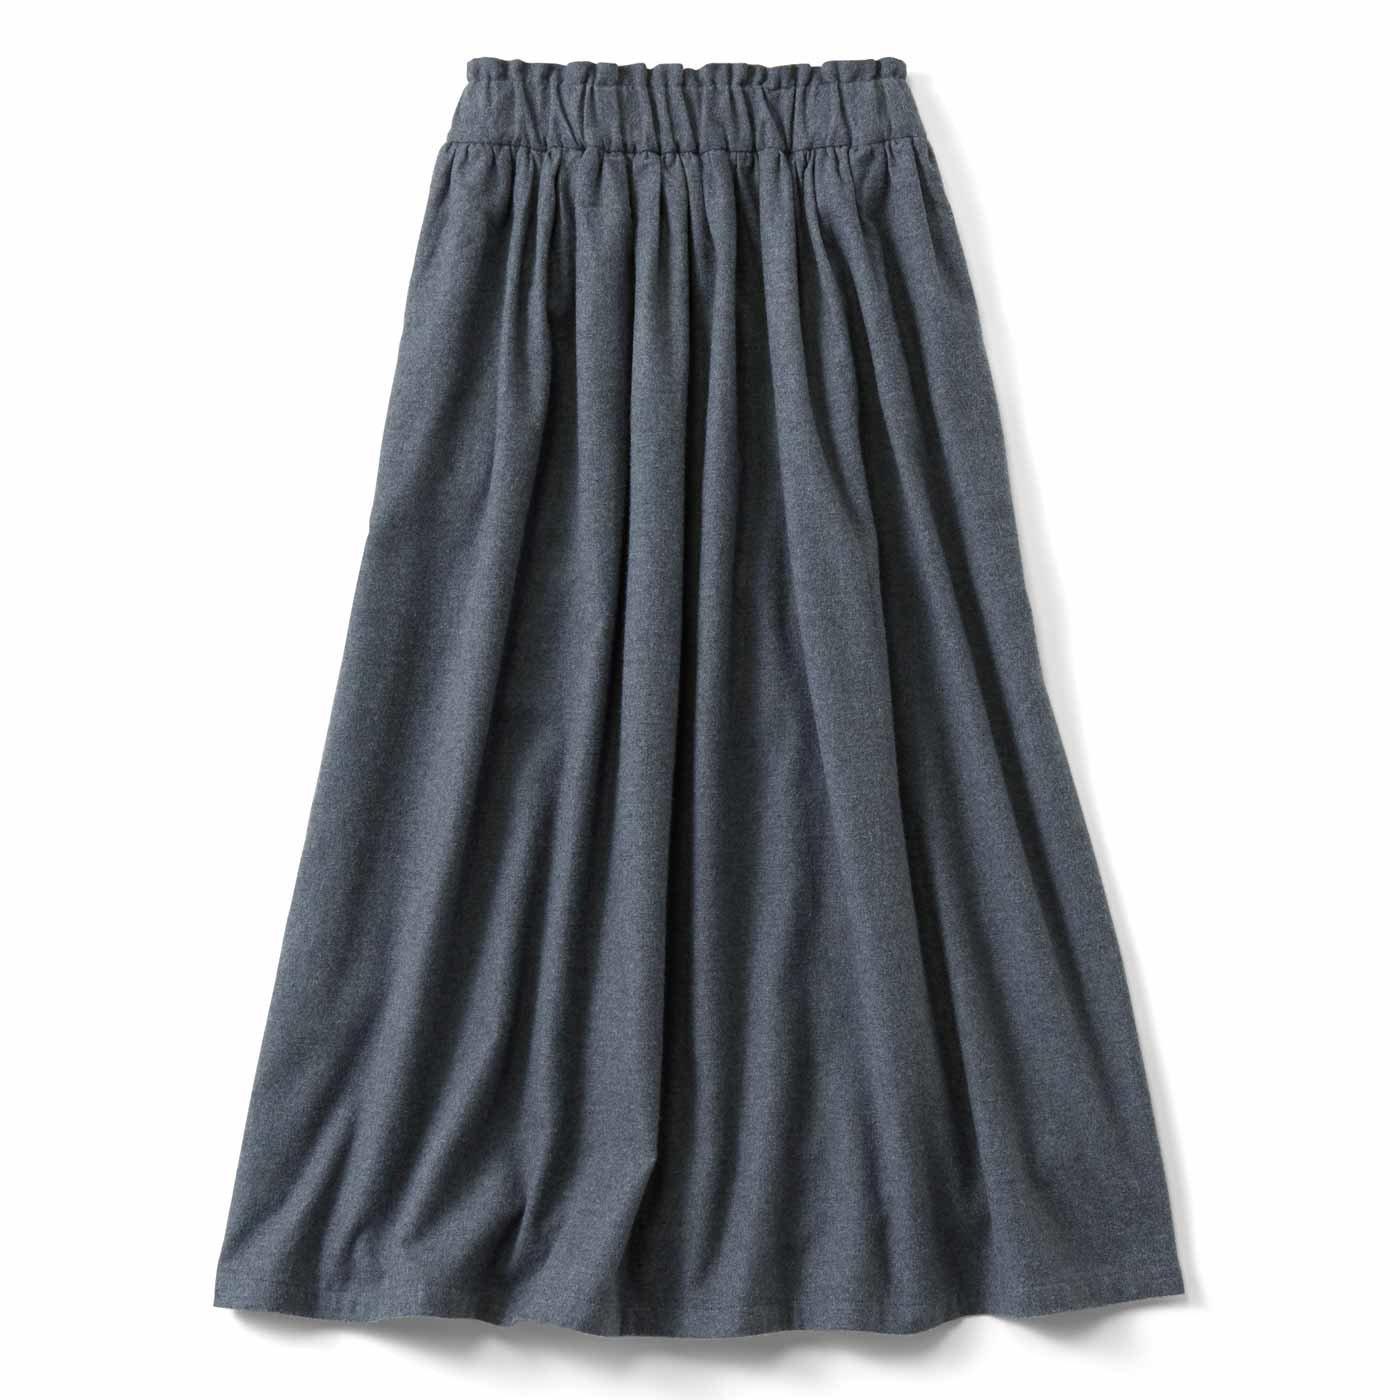 THREE FIFTY STANDARD やわらか起毛のギャザースカート〈杢グレー〉